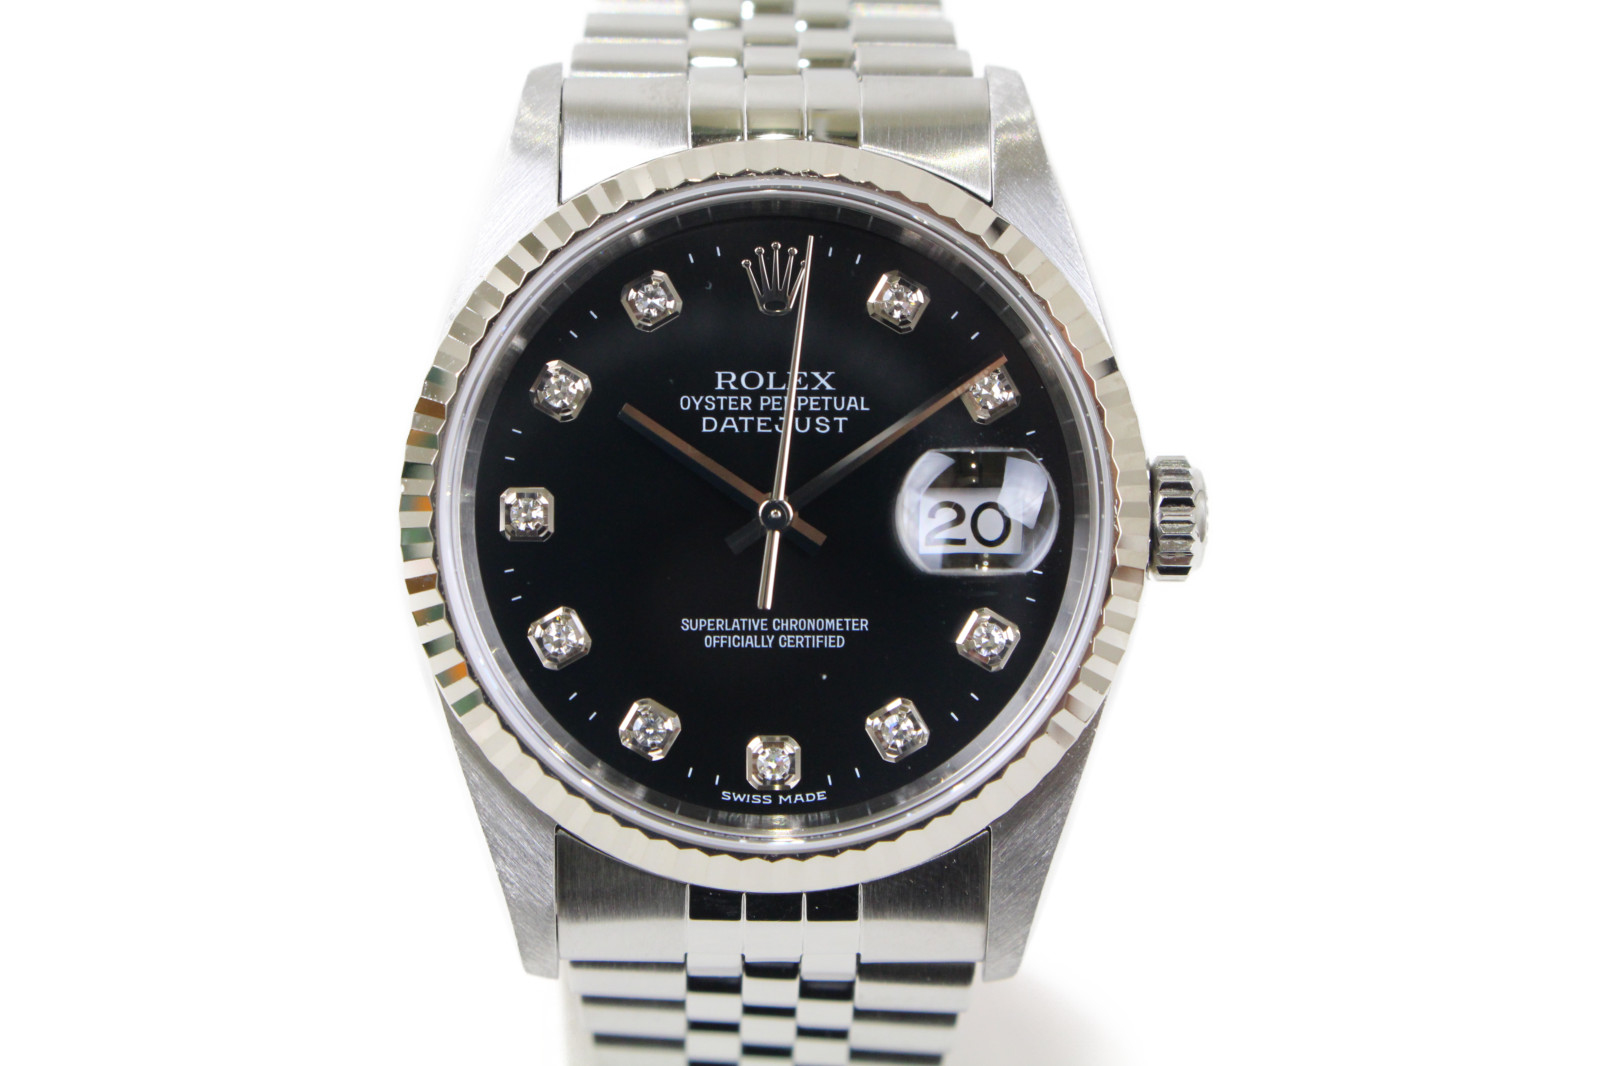 【OH済】ROLEX ロレックス デイトジャスト 16234G K番 自動巻き デイト 10Pダイヤモンド K18WG ホワイトゴールド SS ステンレススチール ブラック メンズ 腕時計【中古】